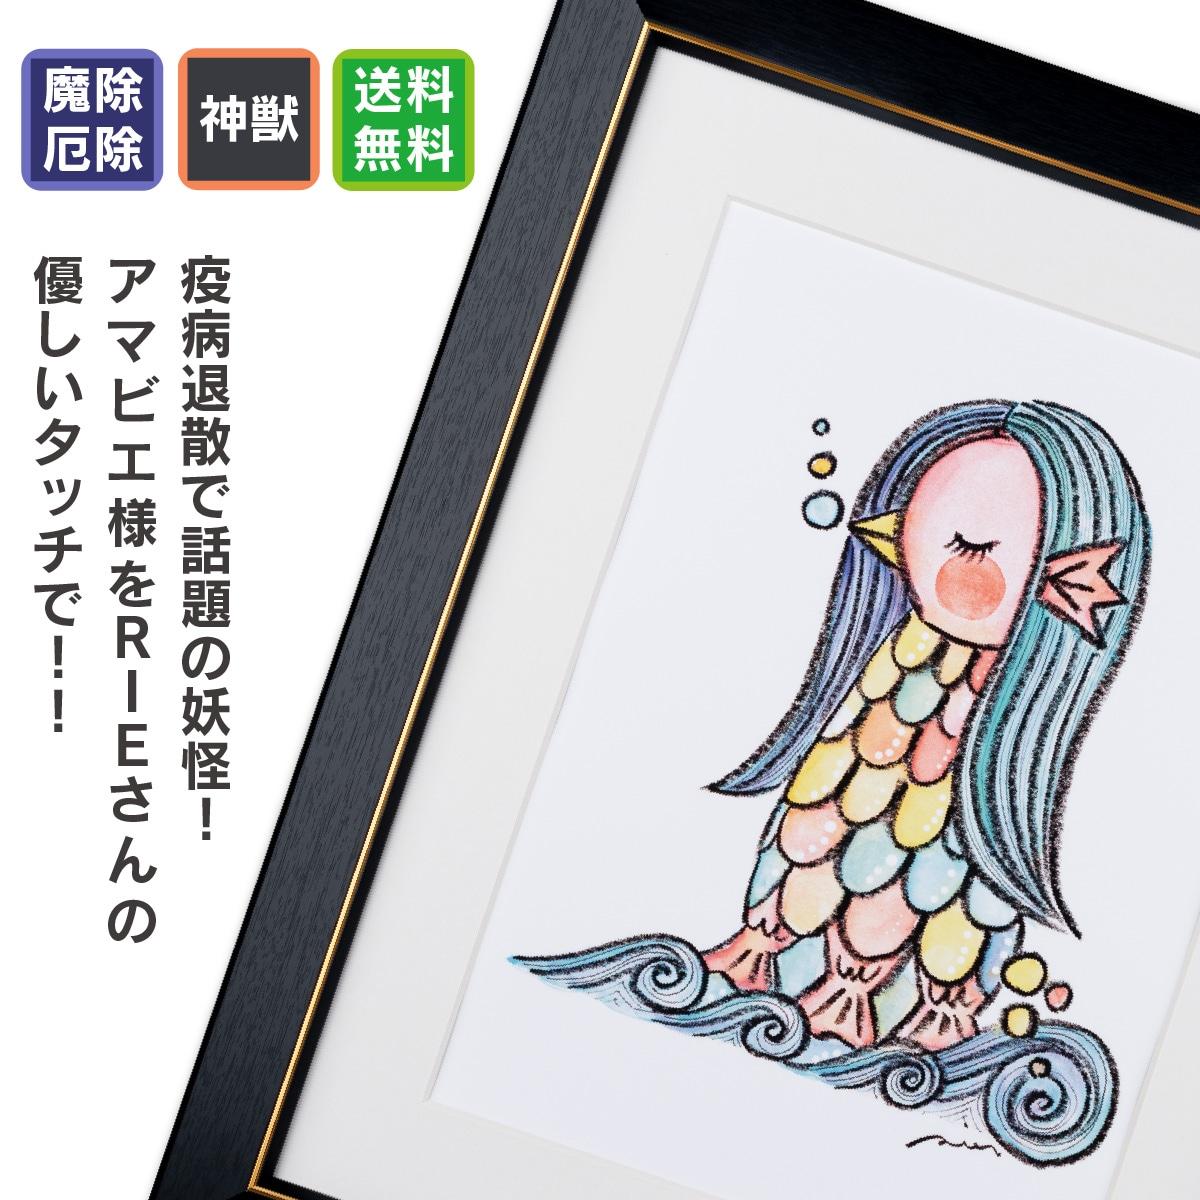 RIEの『AMABIE』A4アートフレーム判 ≫疫病退散!?妖怪アマビエの開運アート 開運グッズ